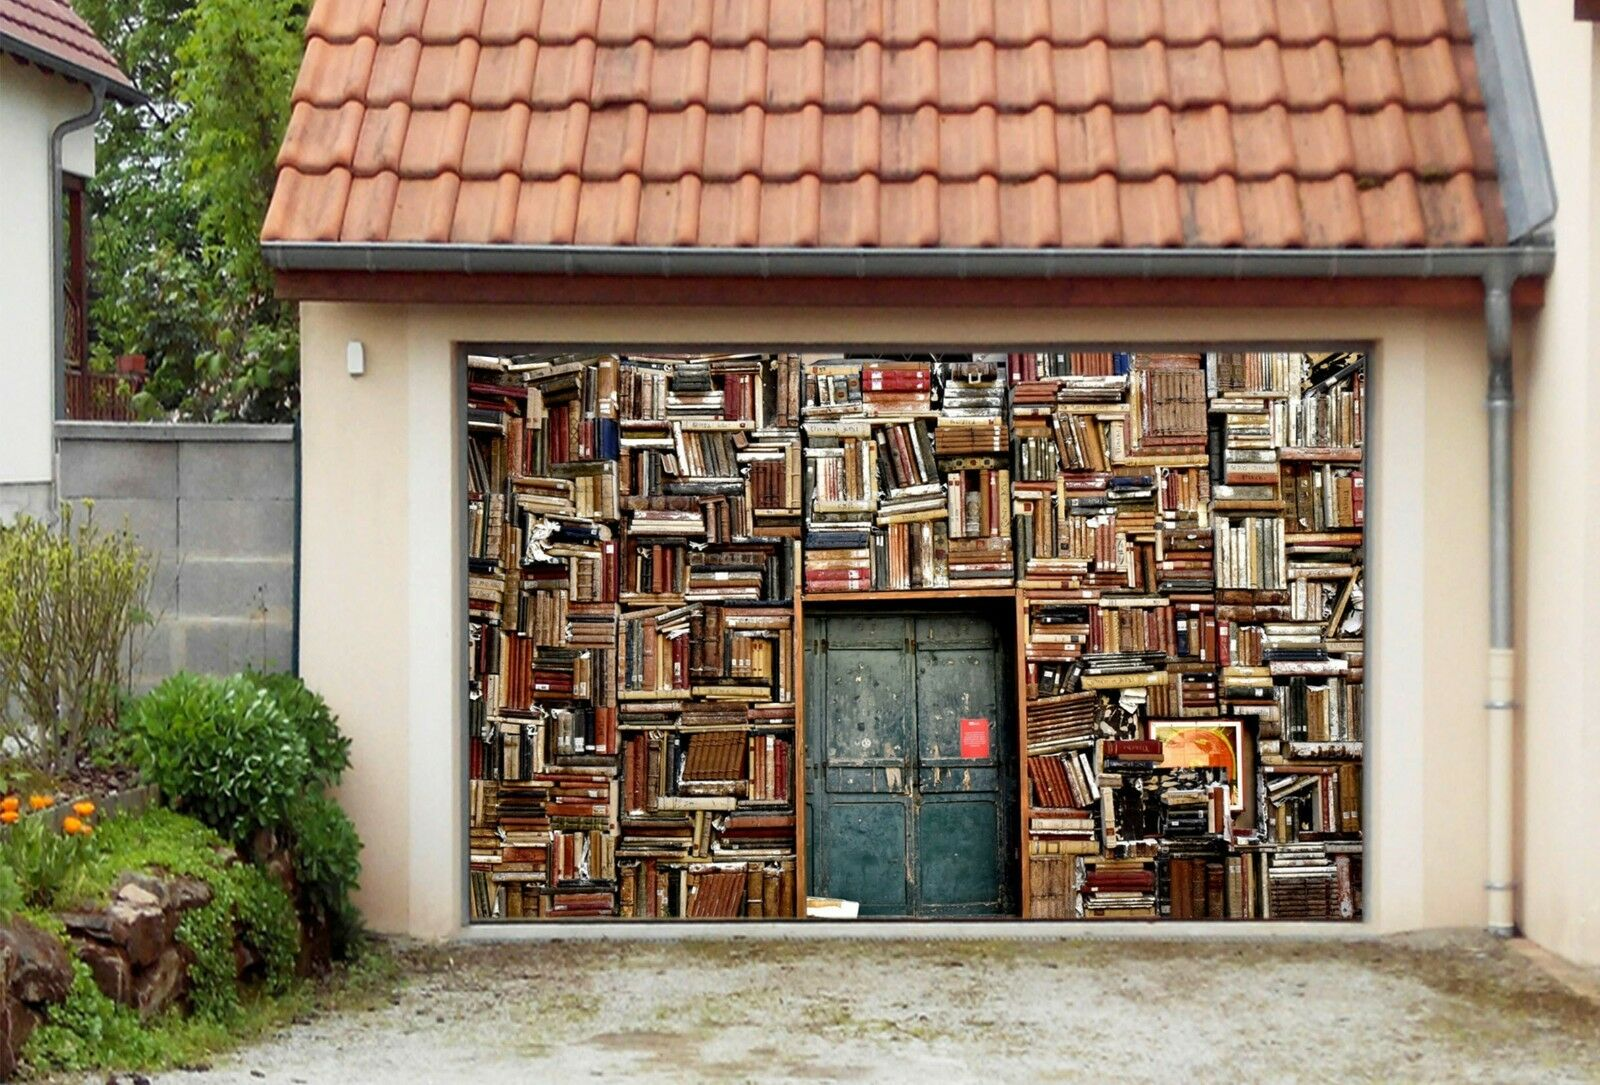 3D Bookstore 783 Garage Door Murals Wall Print Decal Wall AJ WALLPAPER UK Carly